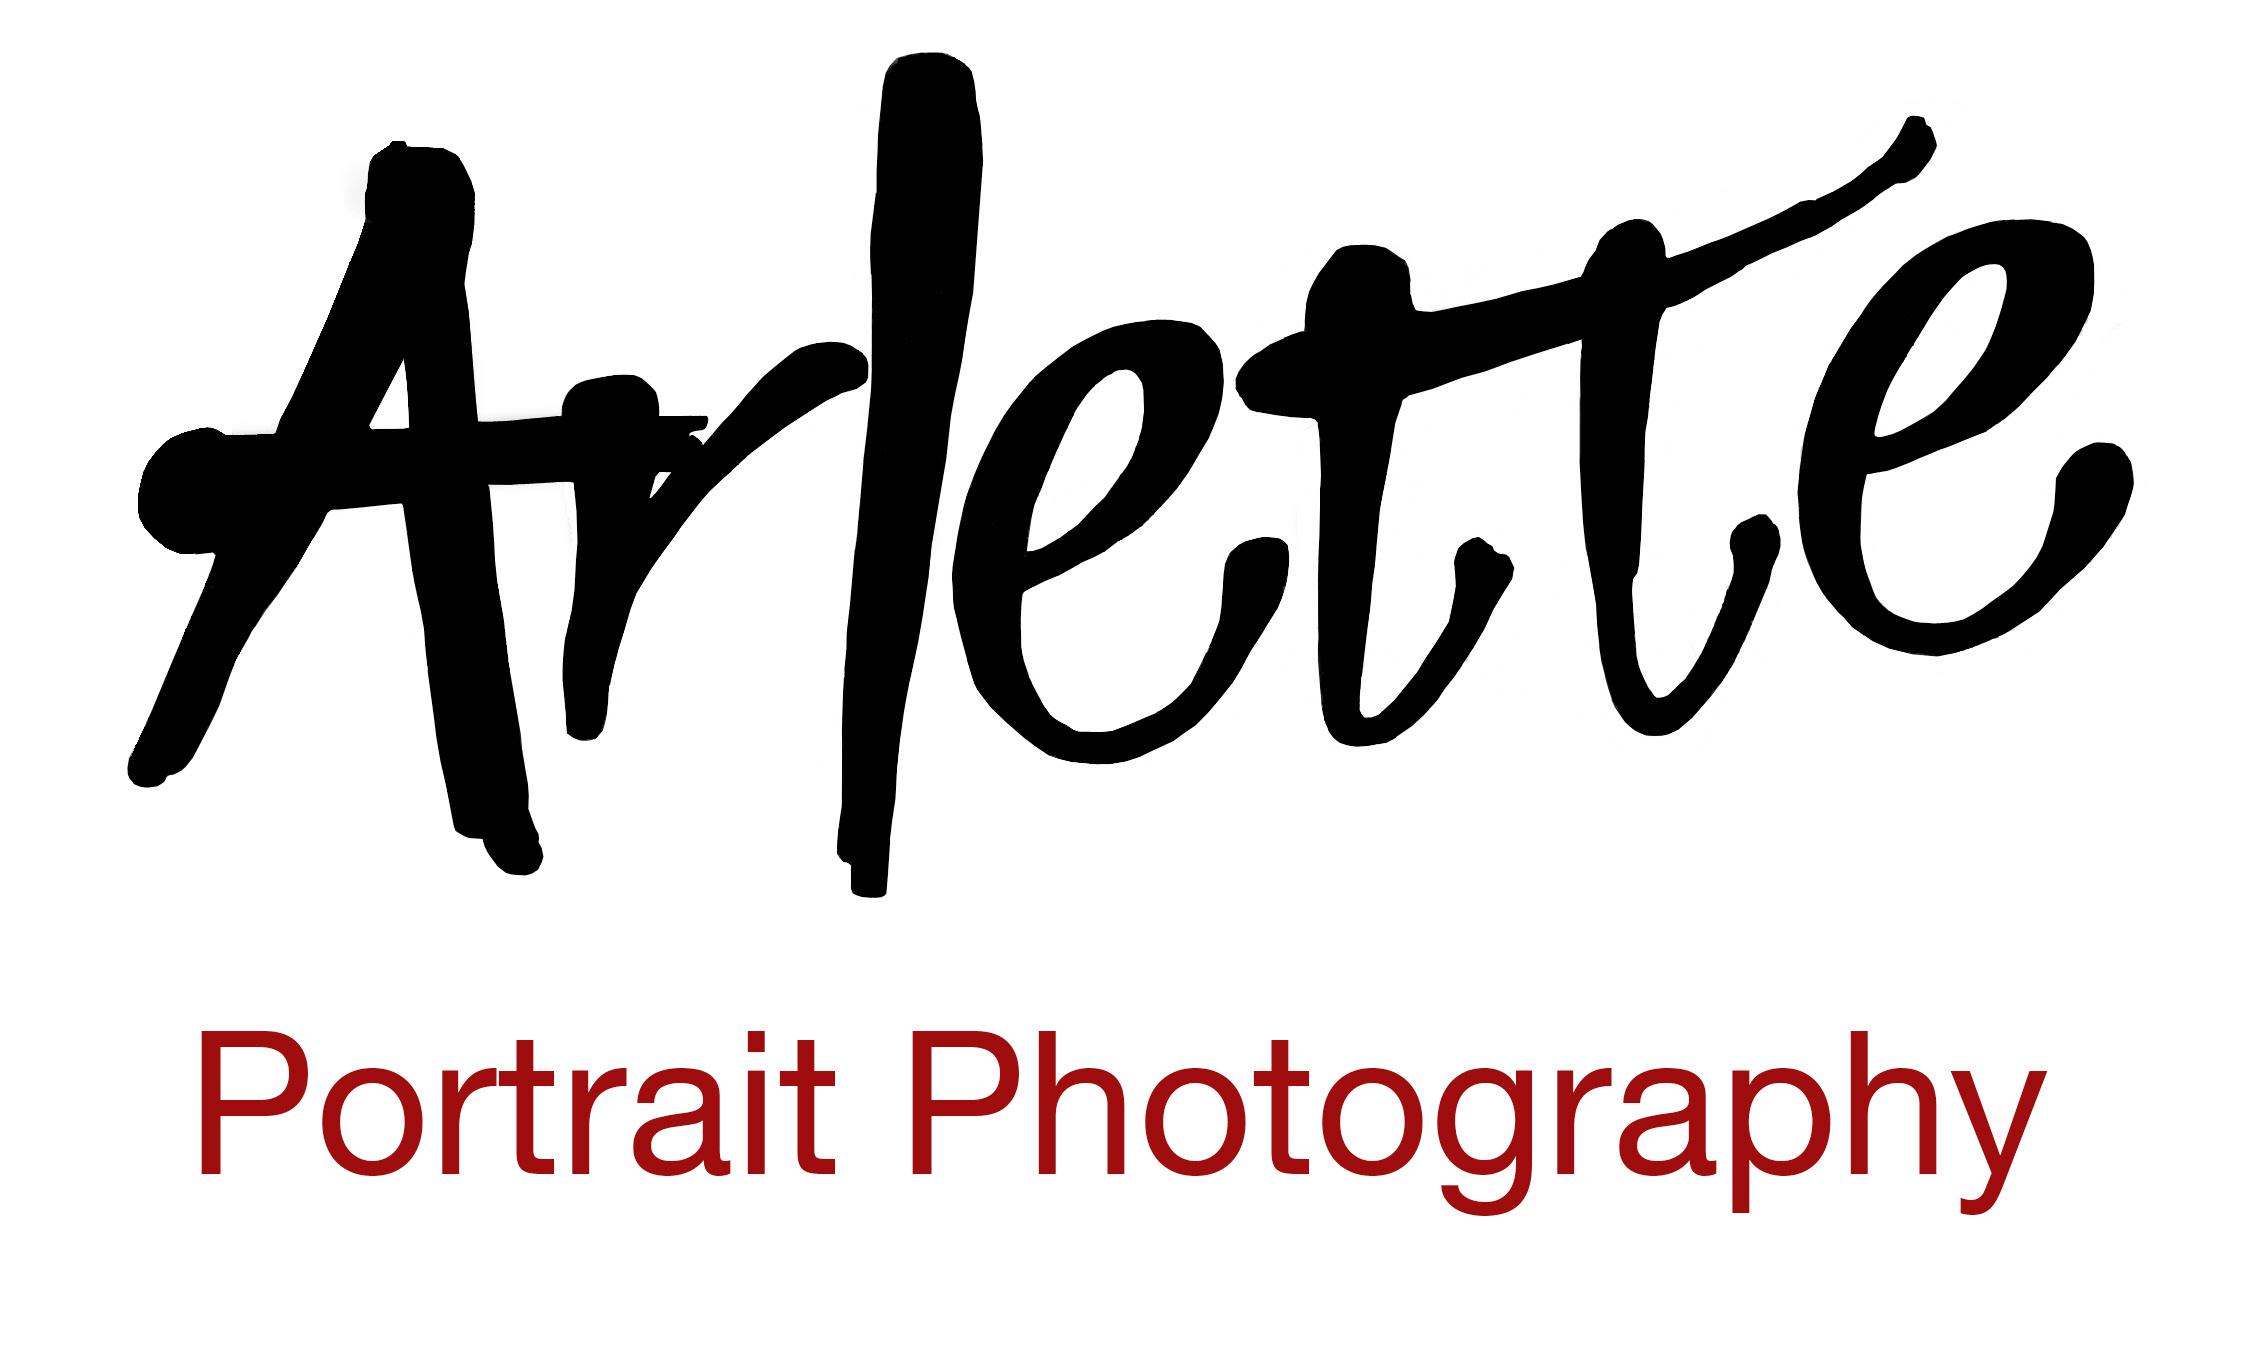 Arlette Olaerts Portrait Photography